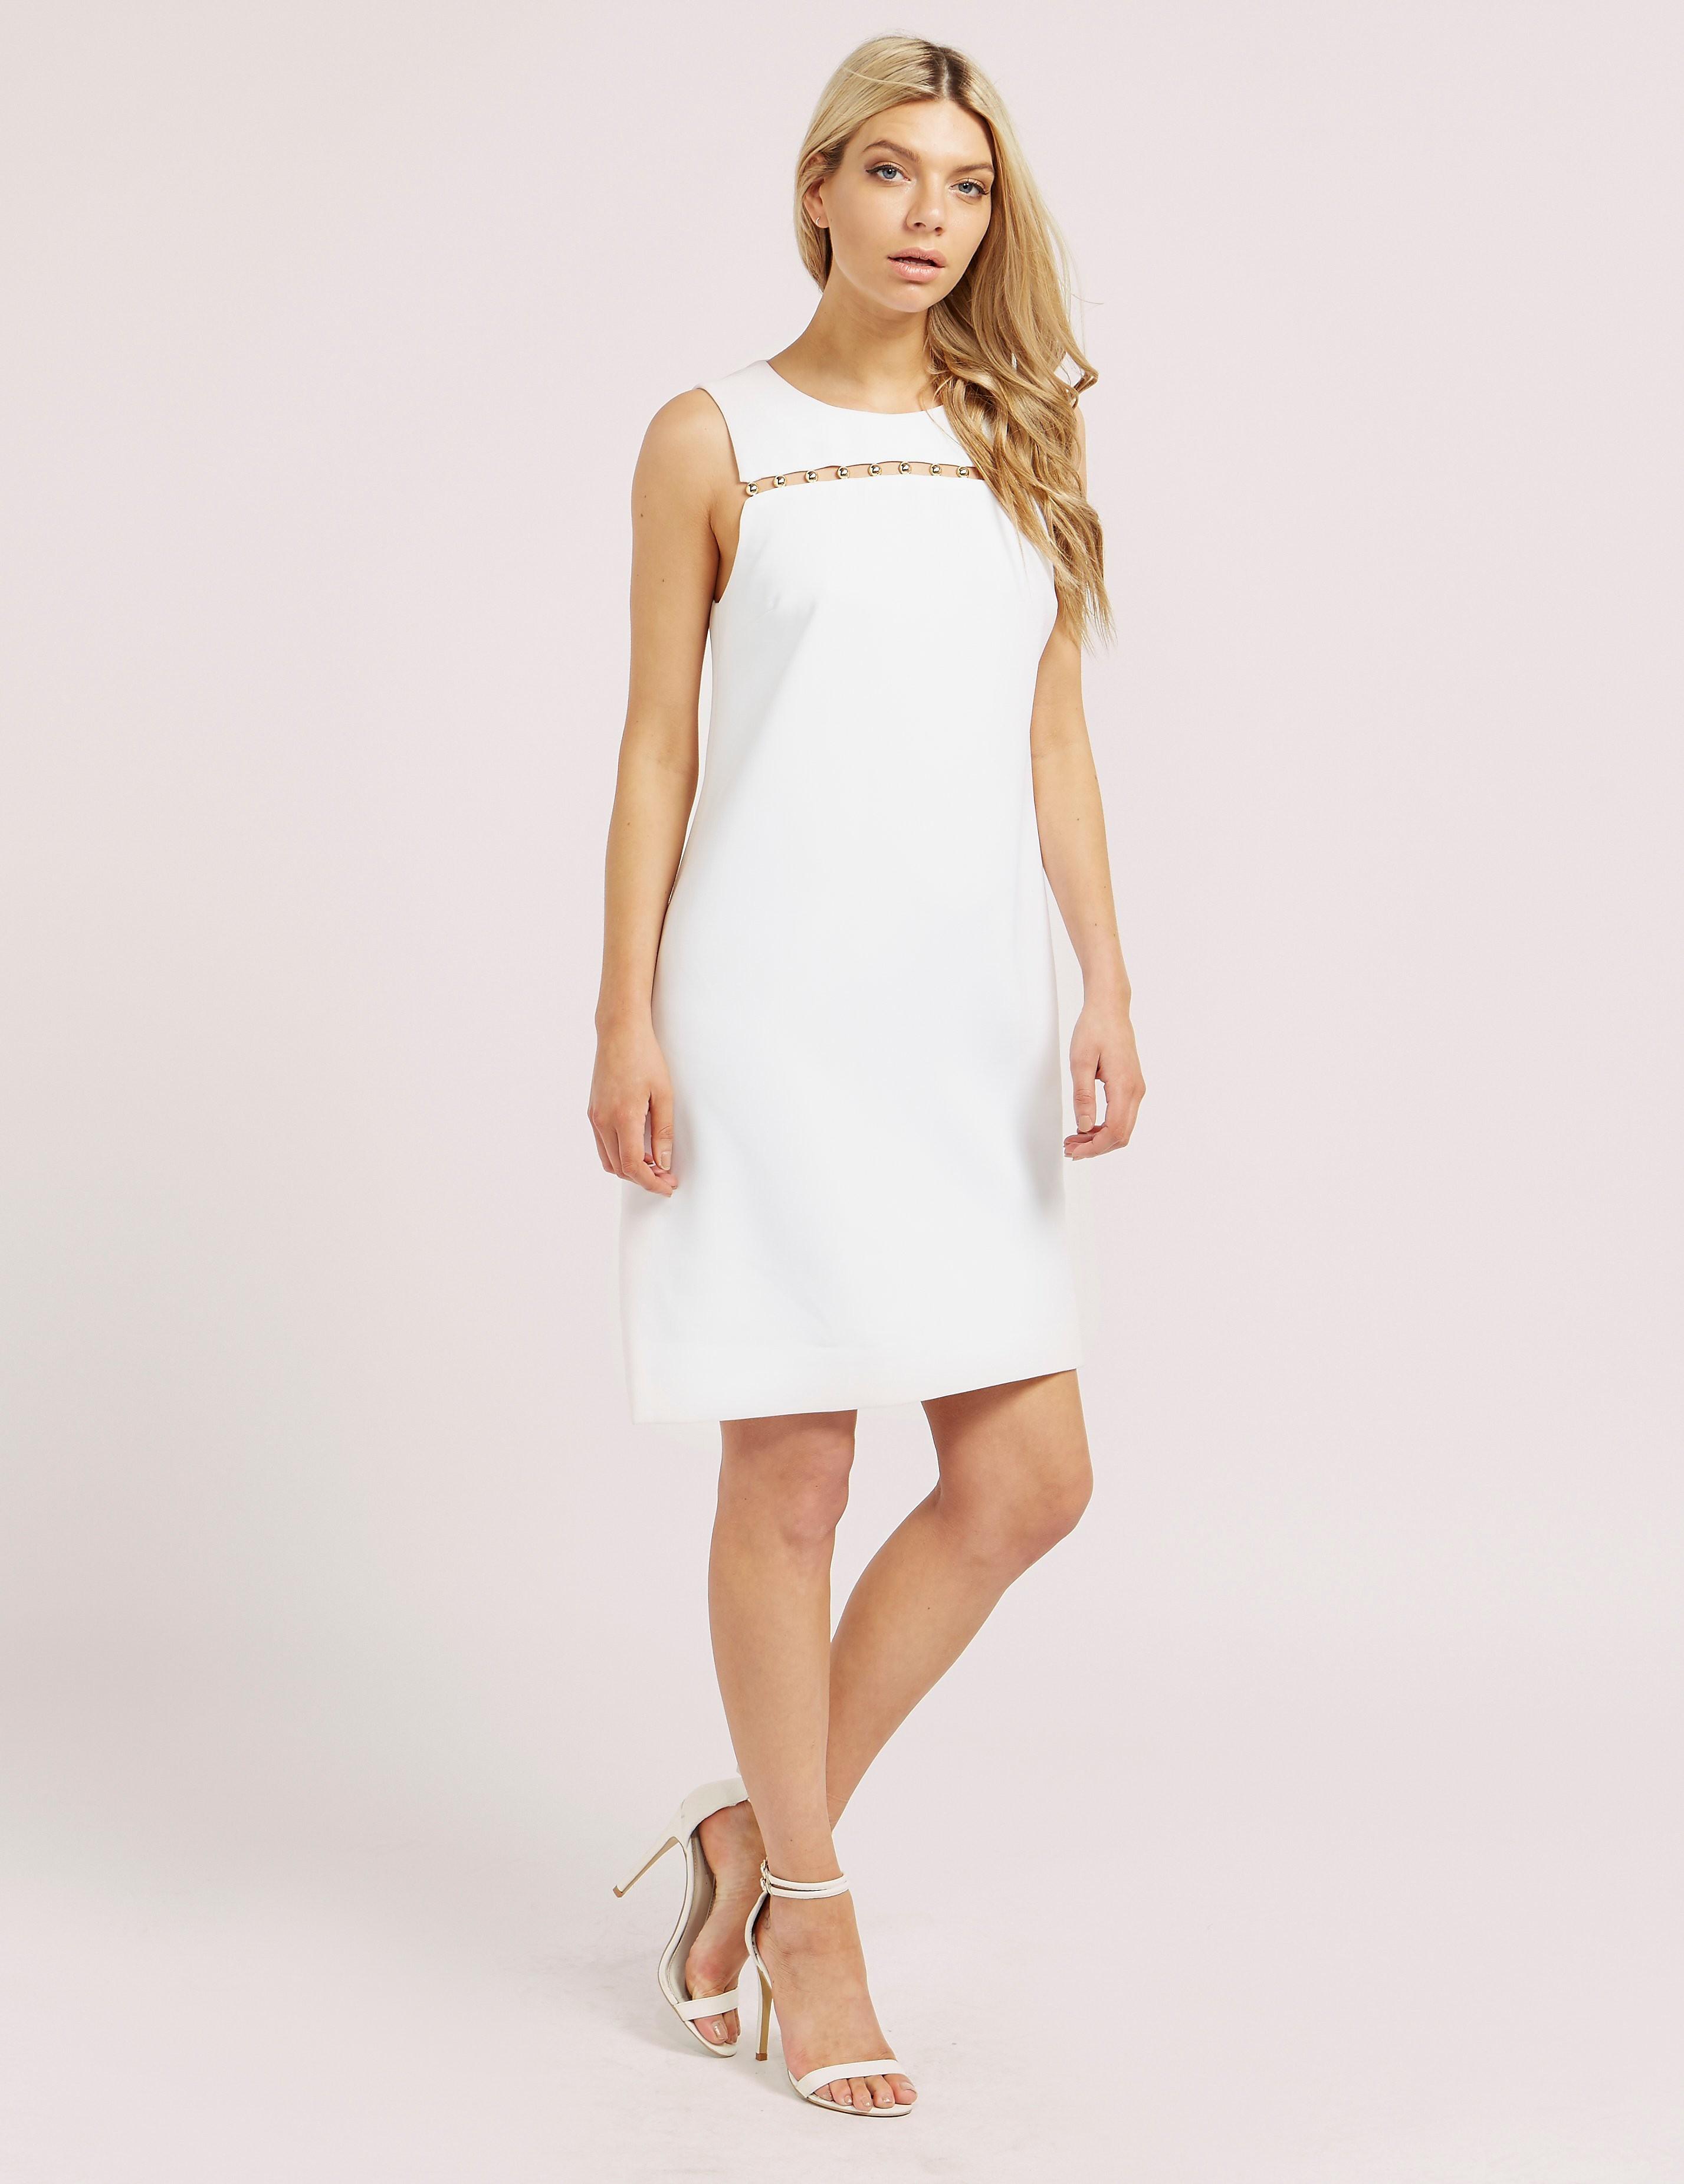 Michael Kors Bead Detail Dress